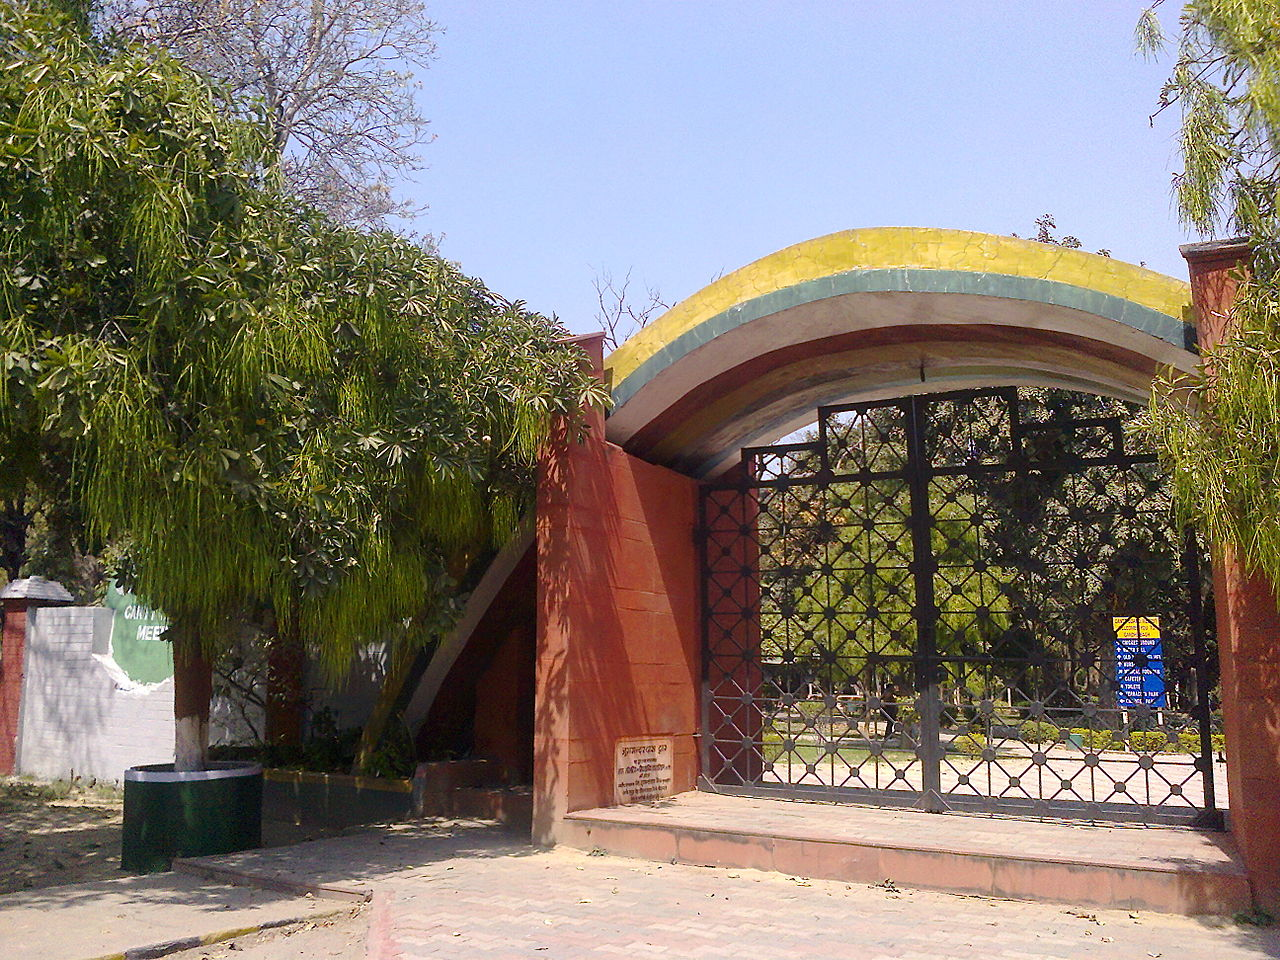 Amazing Place To Visit In Meerut-Gandhi Baghr, Meerut, Uttar Pradesh